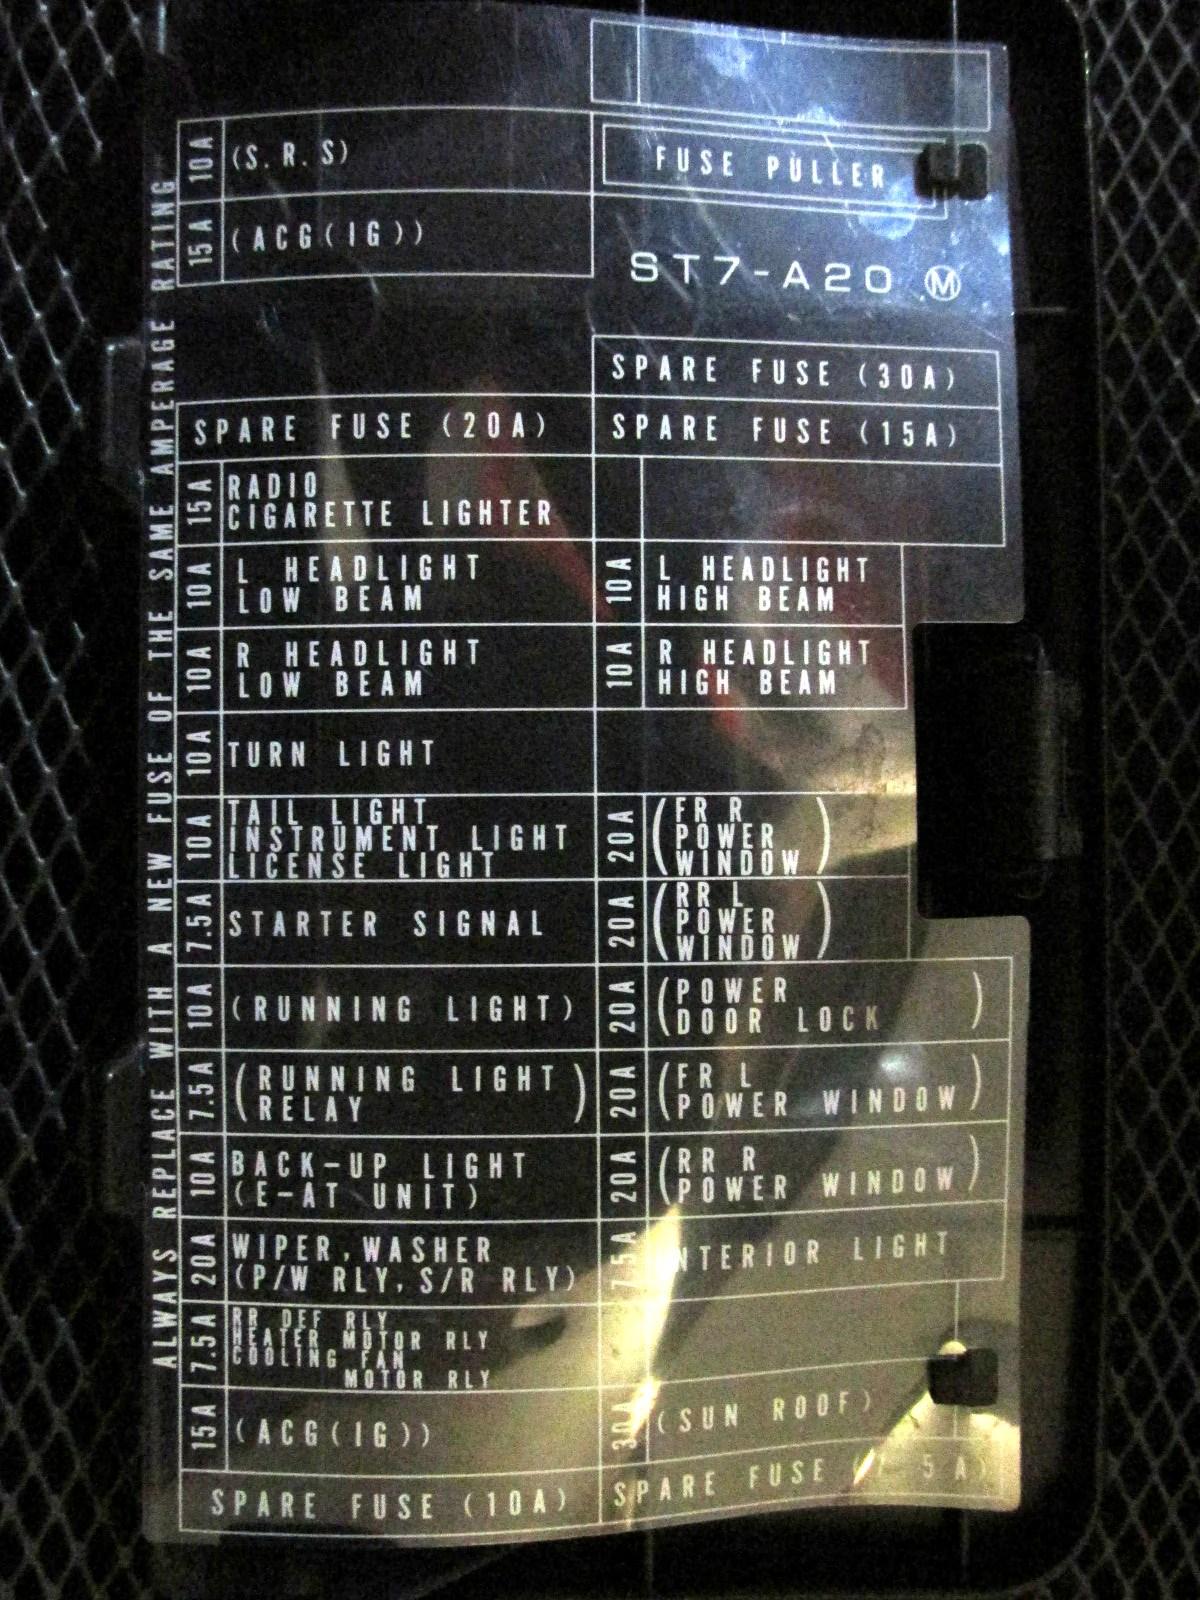 Fuse Box 1994 Acura Integra John Deere 210 Wiring Harness For Wiring Diagram Schematics